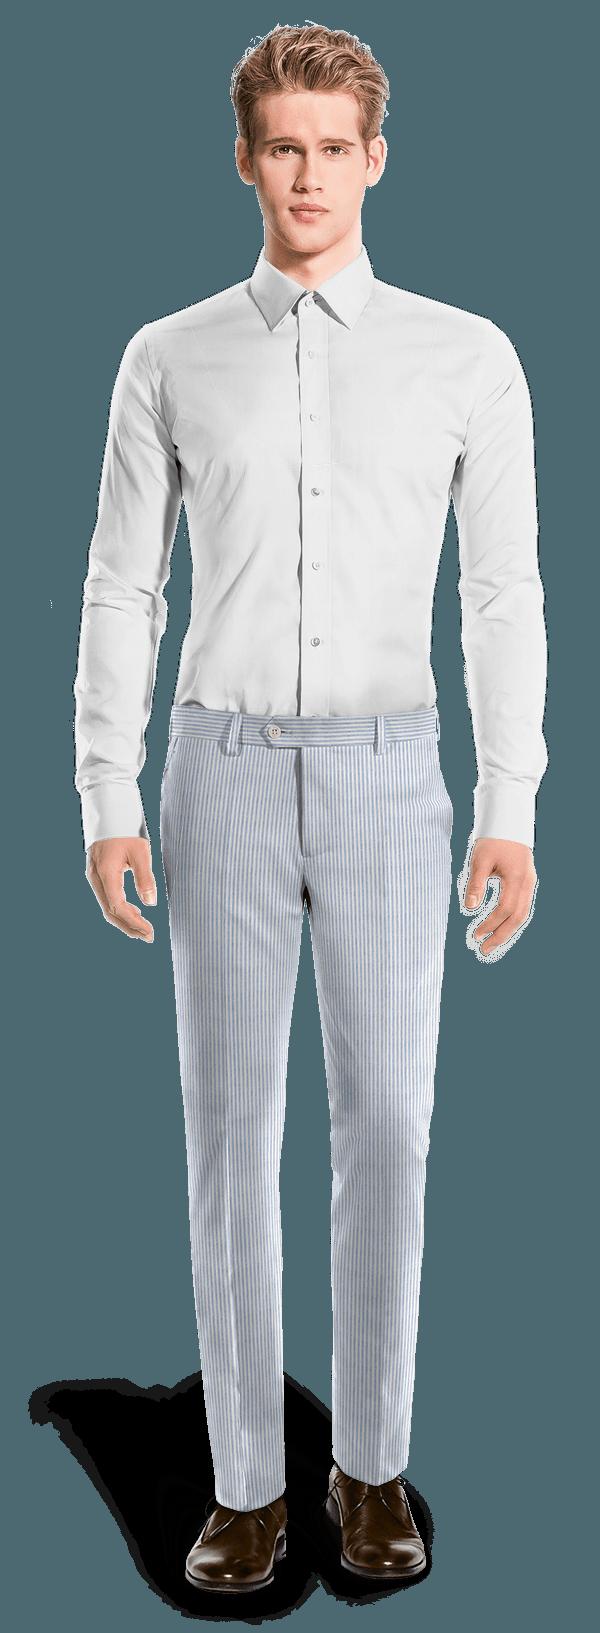 Blaue gestreifte Hose aus seersucker